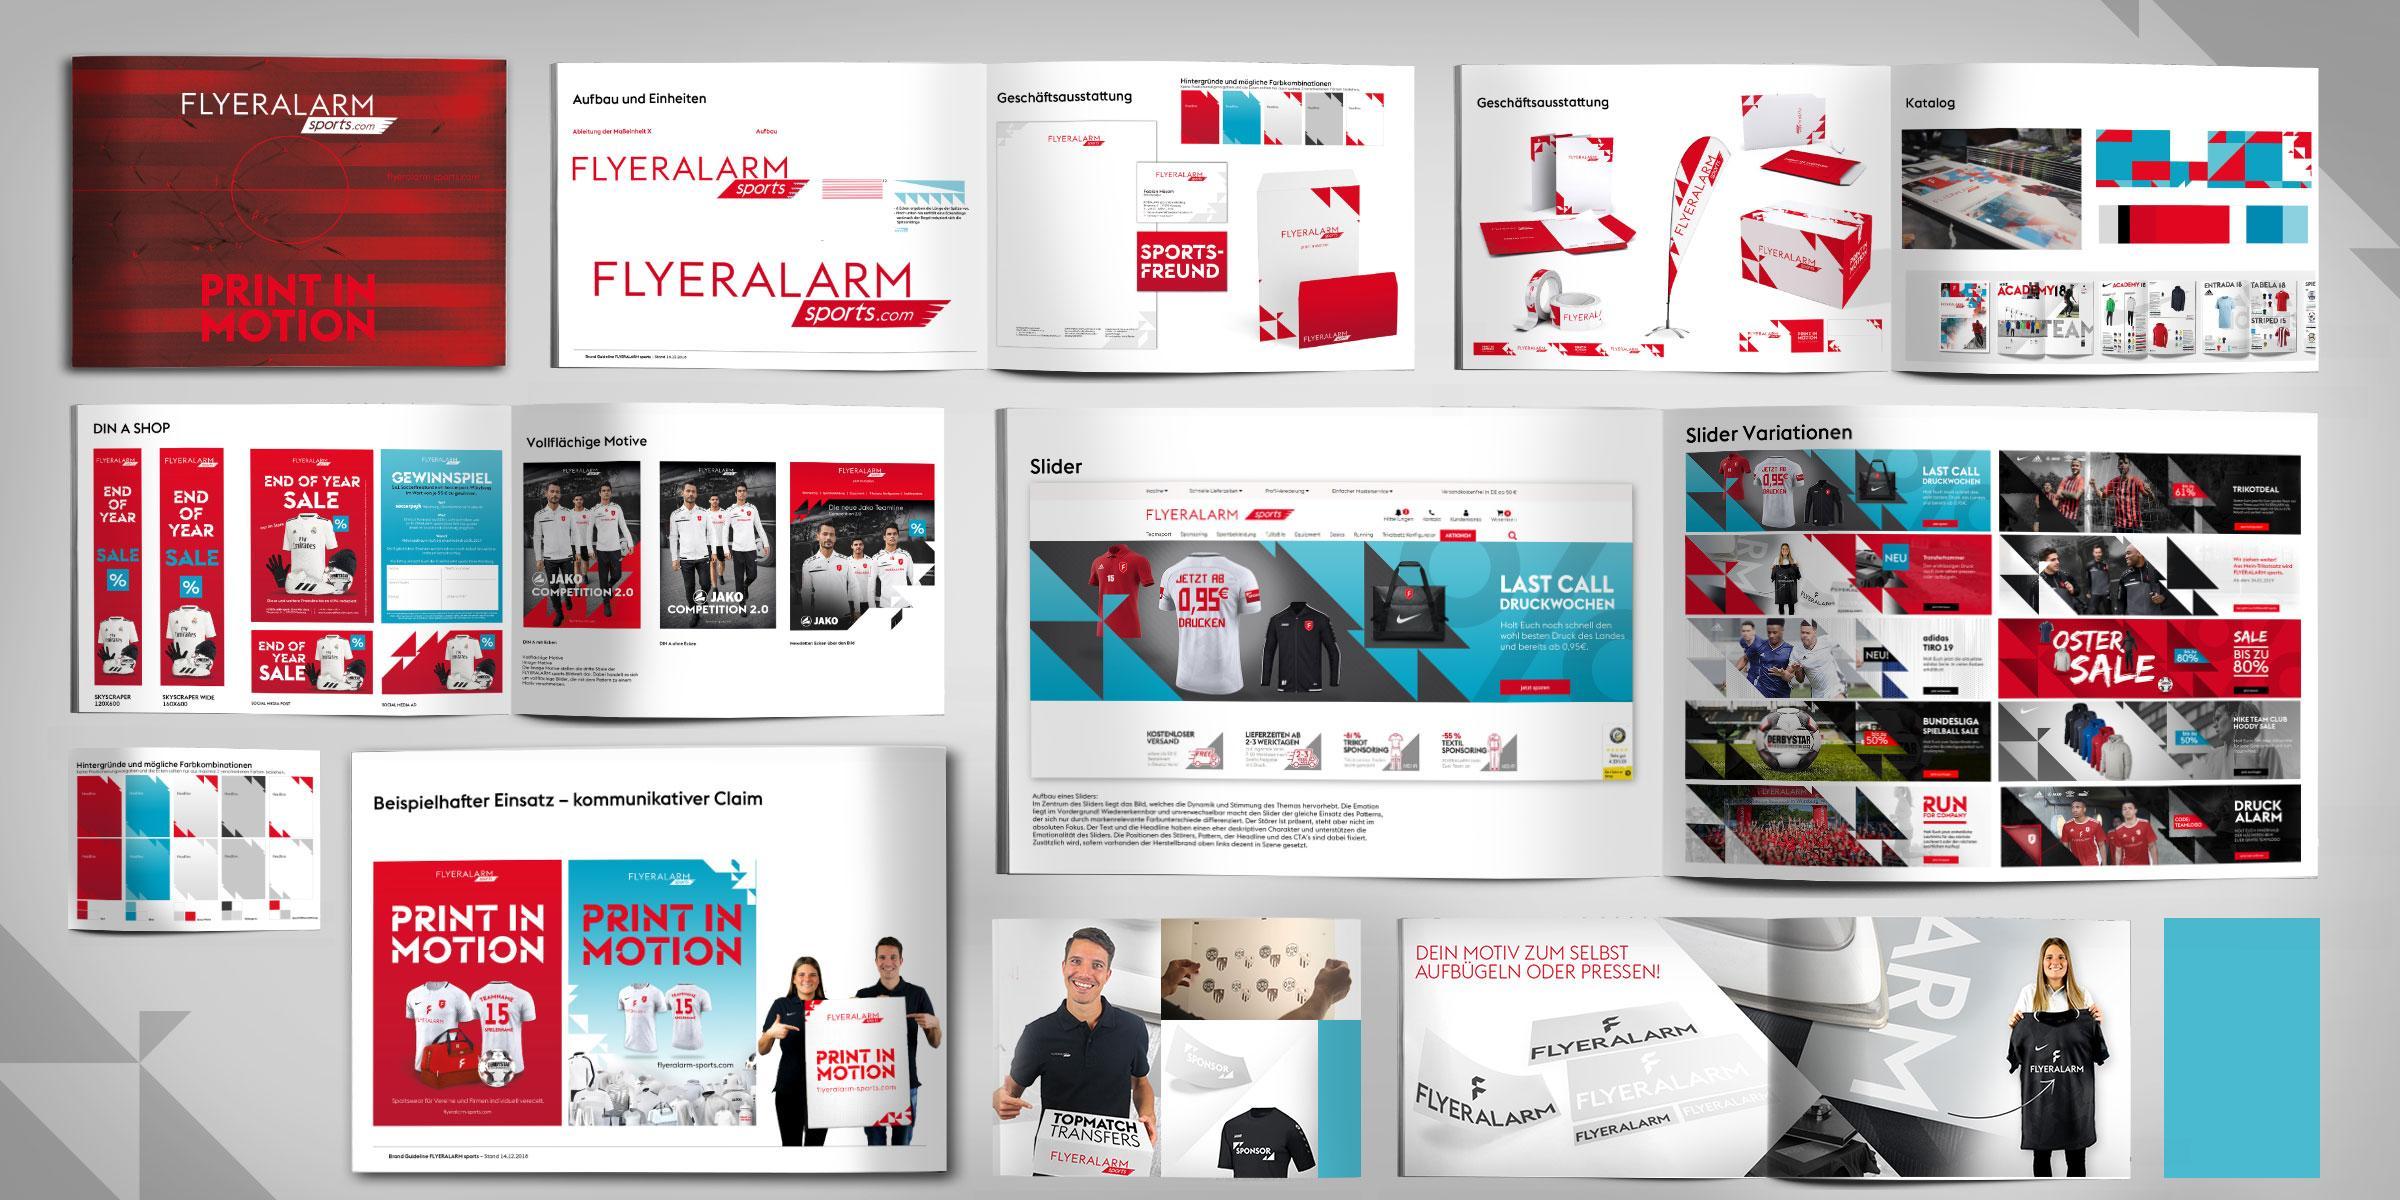 2 gfd gregor fenger designworks for fa sports de branding corporate design smm sma social media marketing online